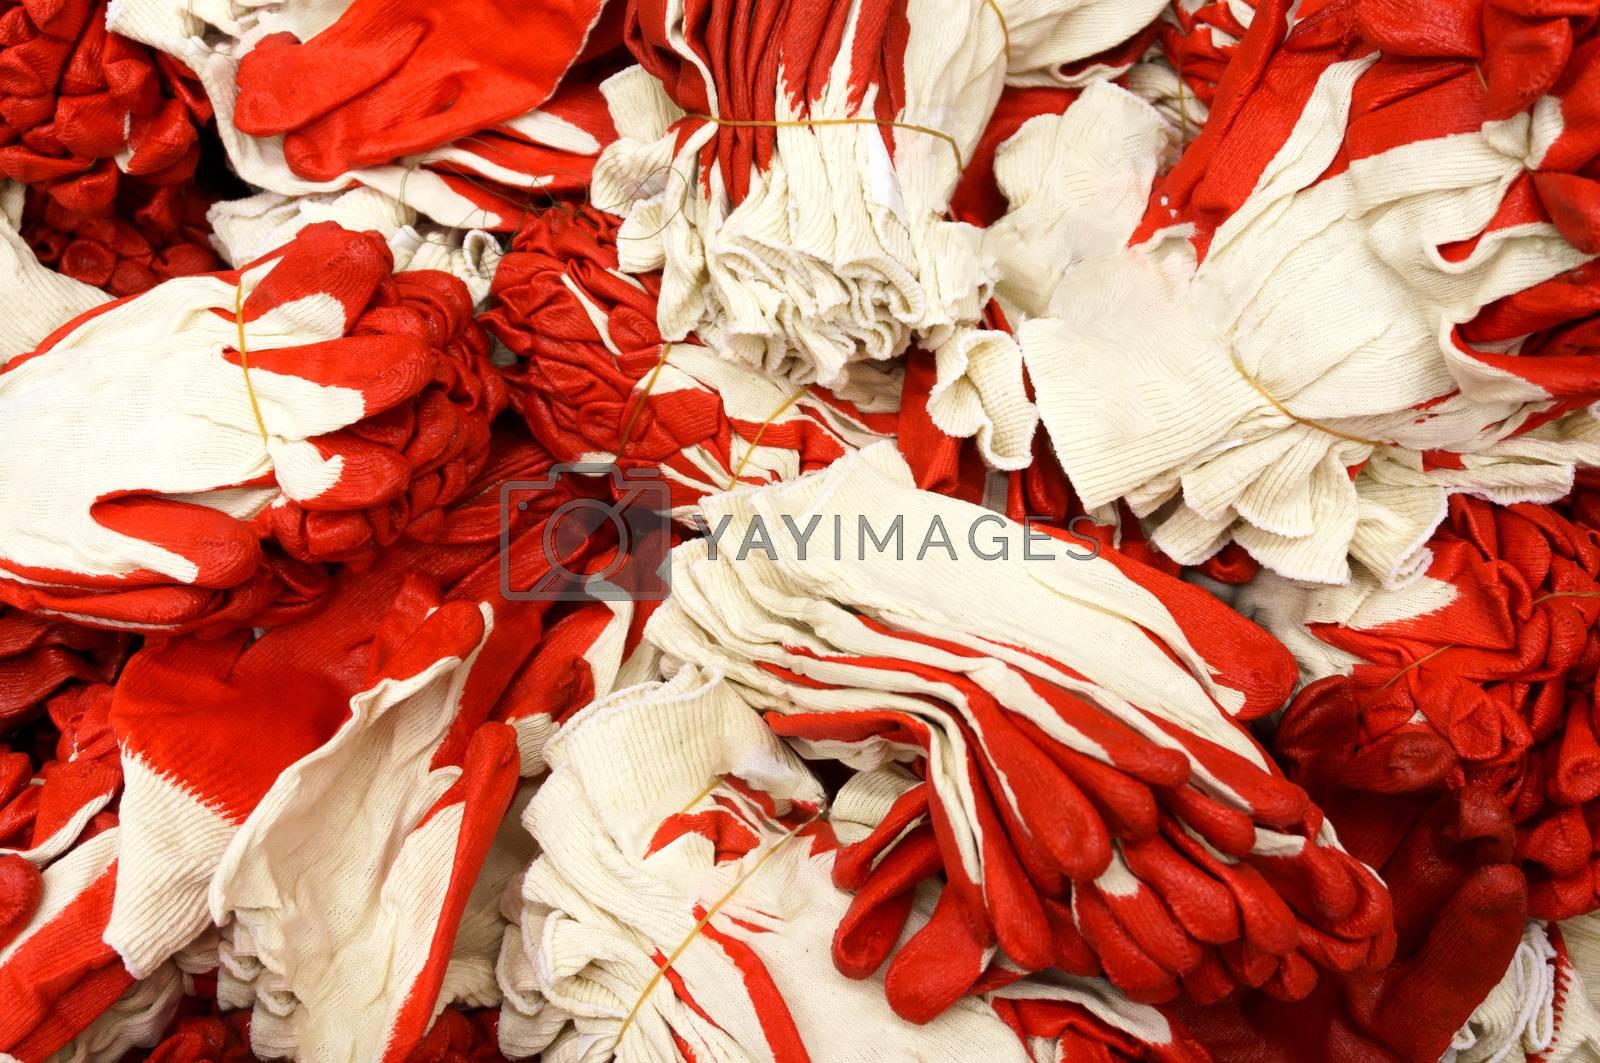 Closeup shot of big pile of work gloves